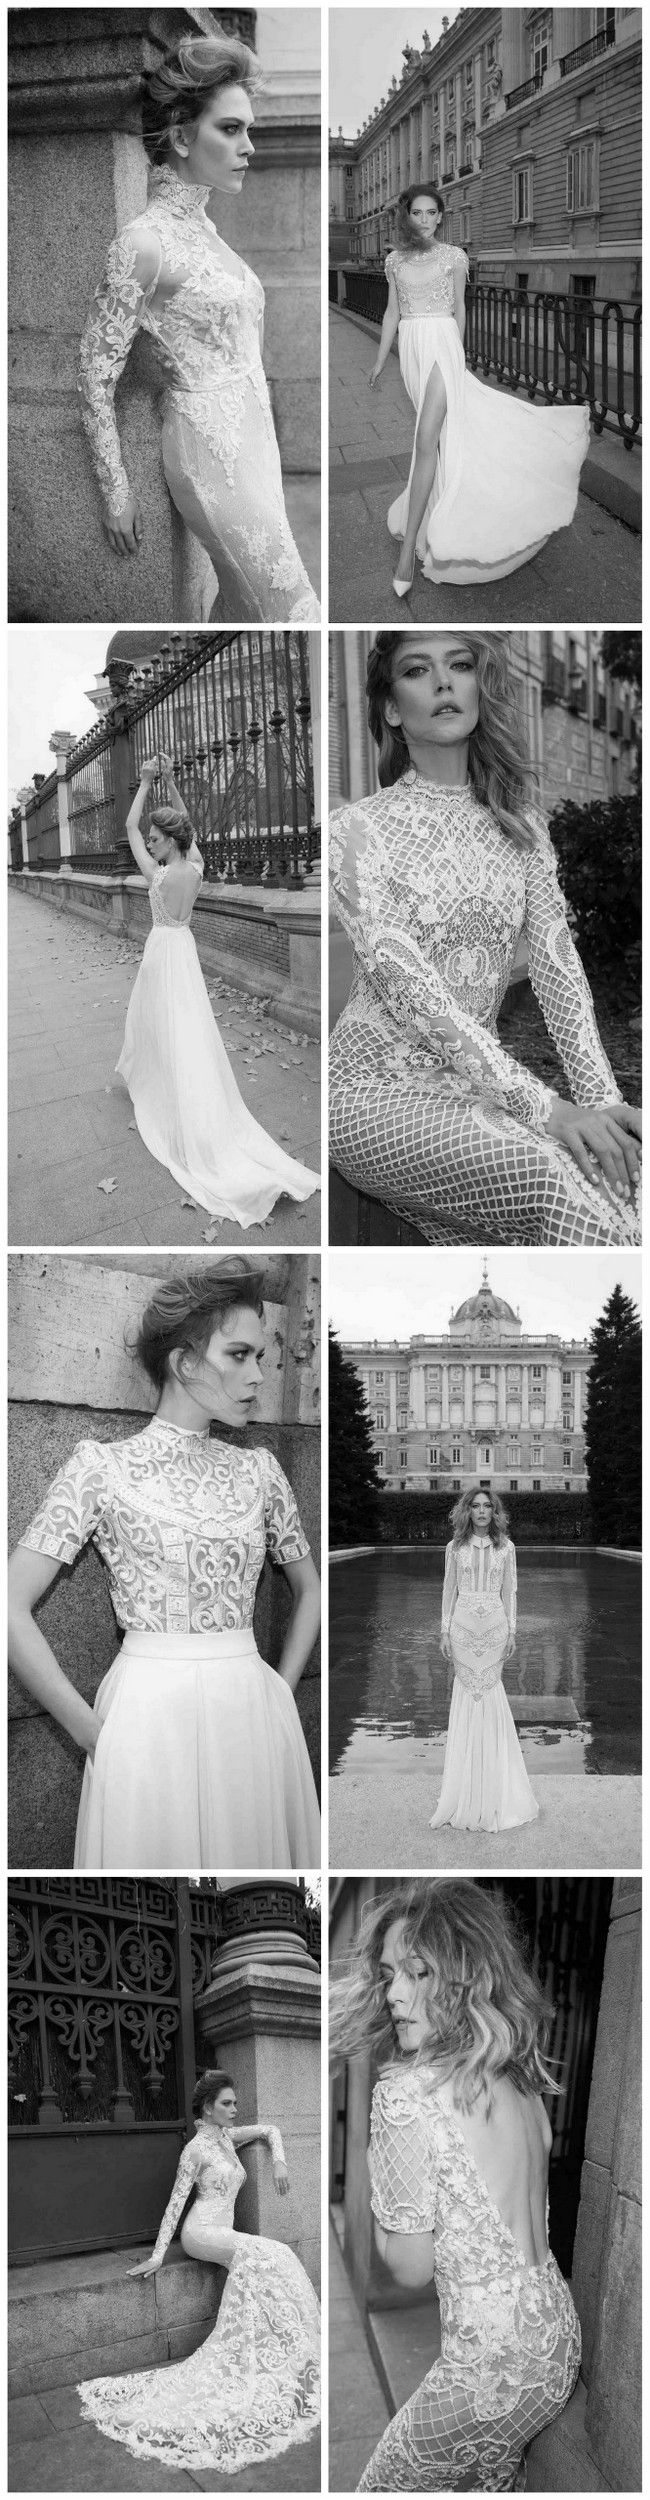 yaki ravid couture wedding dresses 2